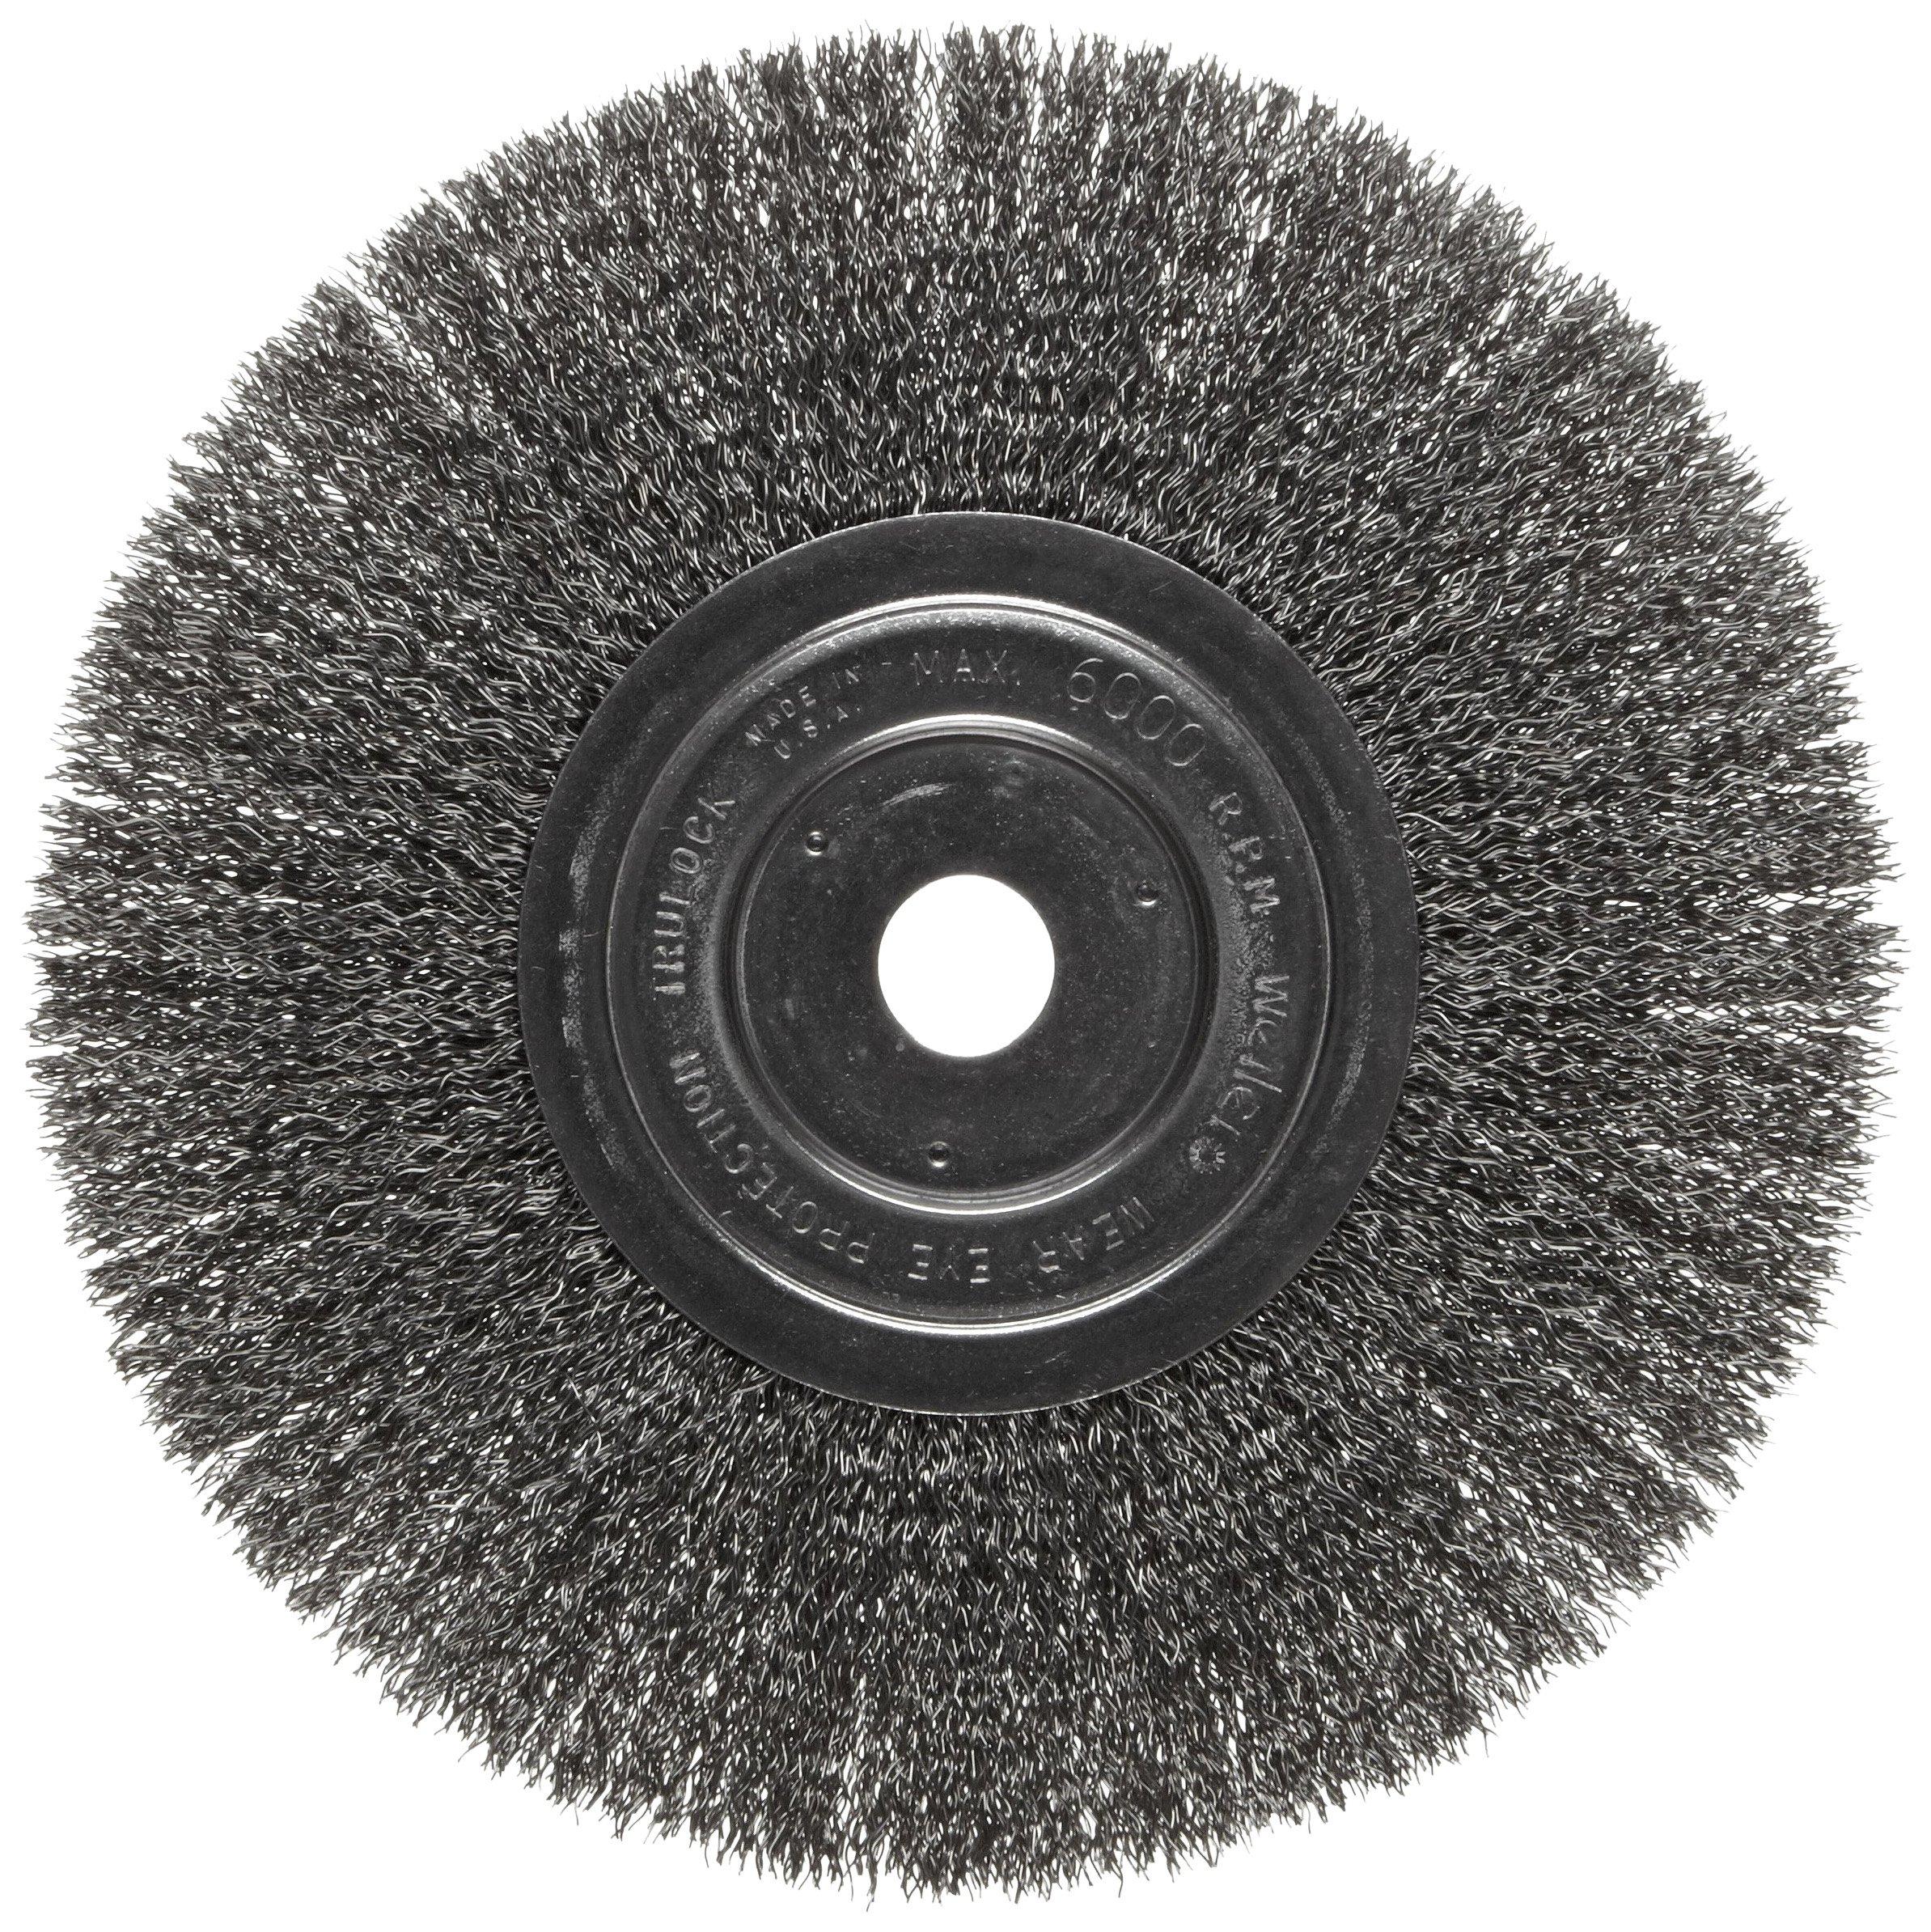 Weiler Trulock Narrow Face Wire Wheel Brush, Round Hole, Steel, Crimped Wire, 8'' Diameter, 0.014'' Wire Diameter, 3/4'' Arbor, 2-1/16'' Bristle Length, 3/4'' Brush Face Width, 6000 rpm